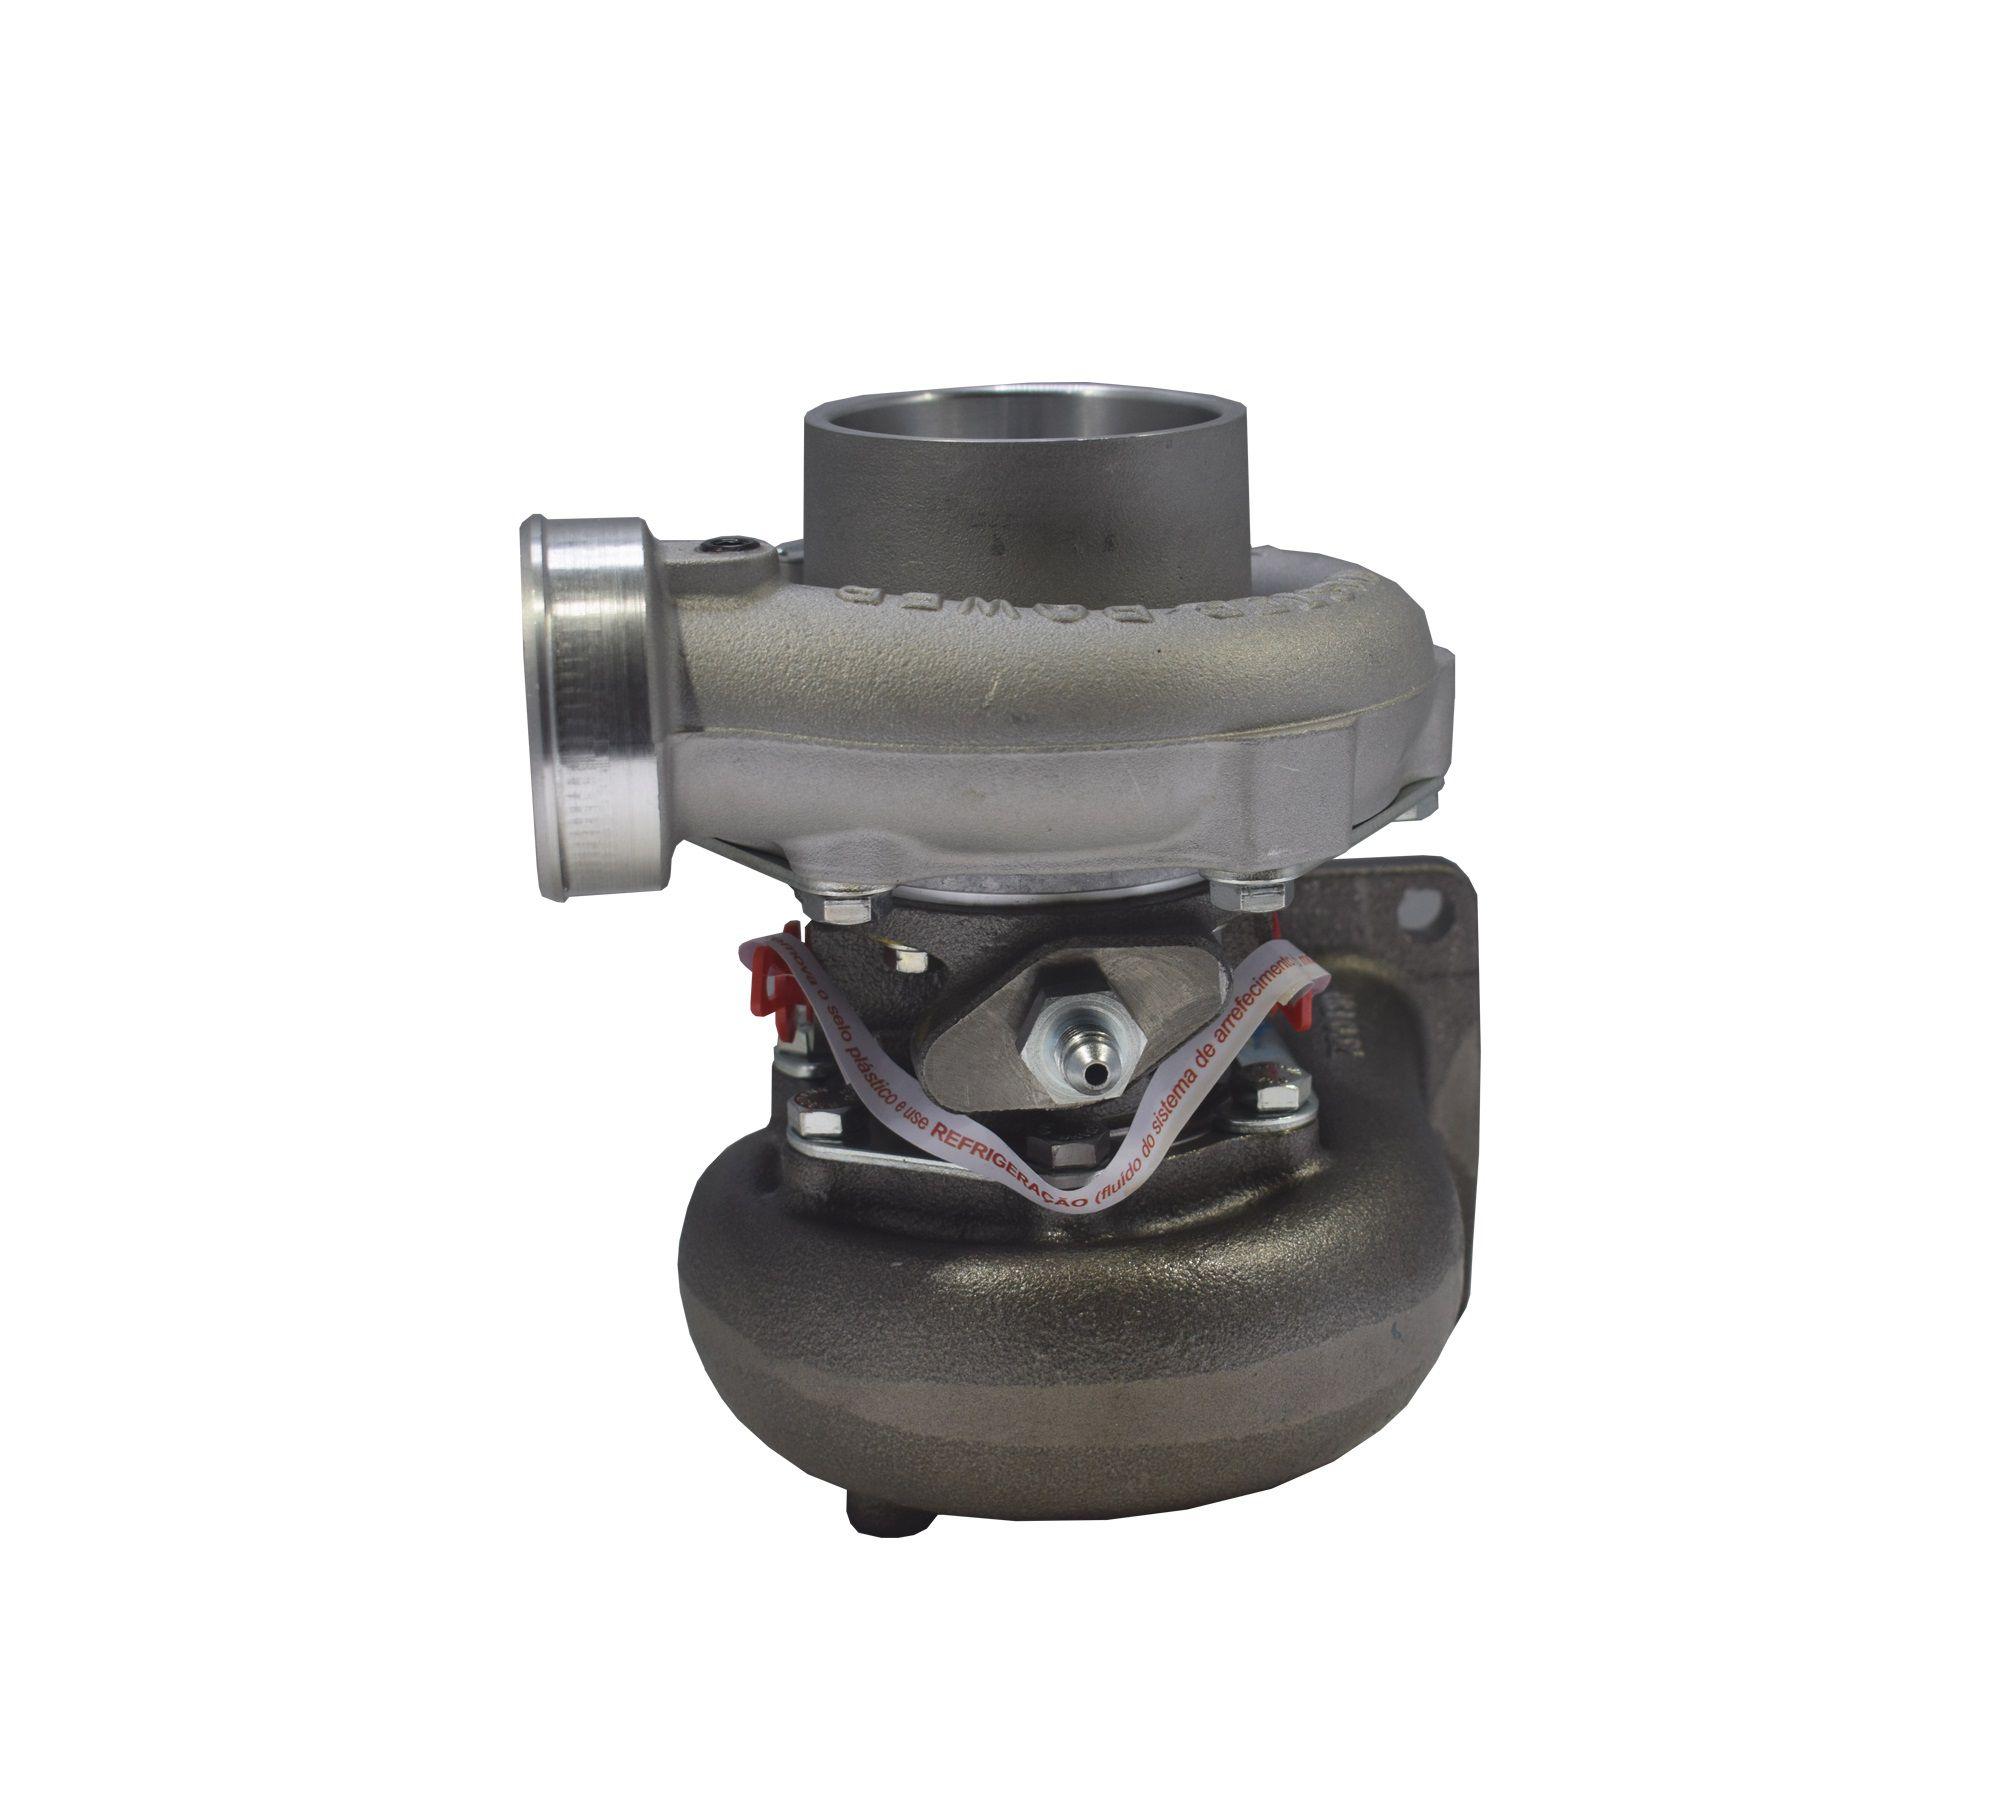 Turbina Roletada / Bearing Master Power - RB 4449 48. Valvulada (envio 01/08)